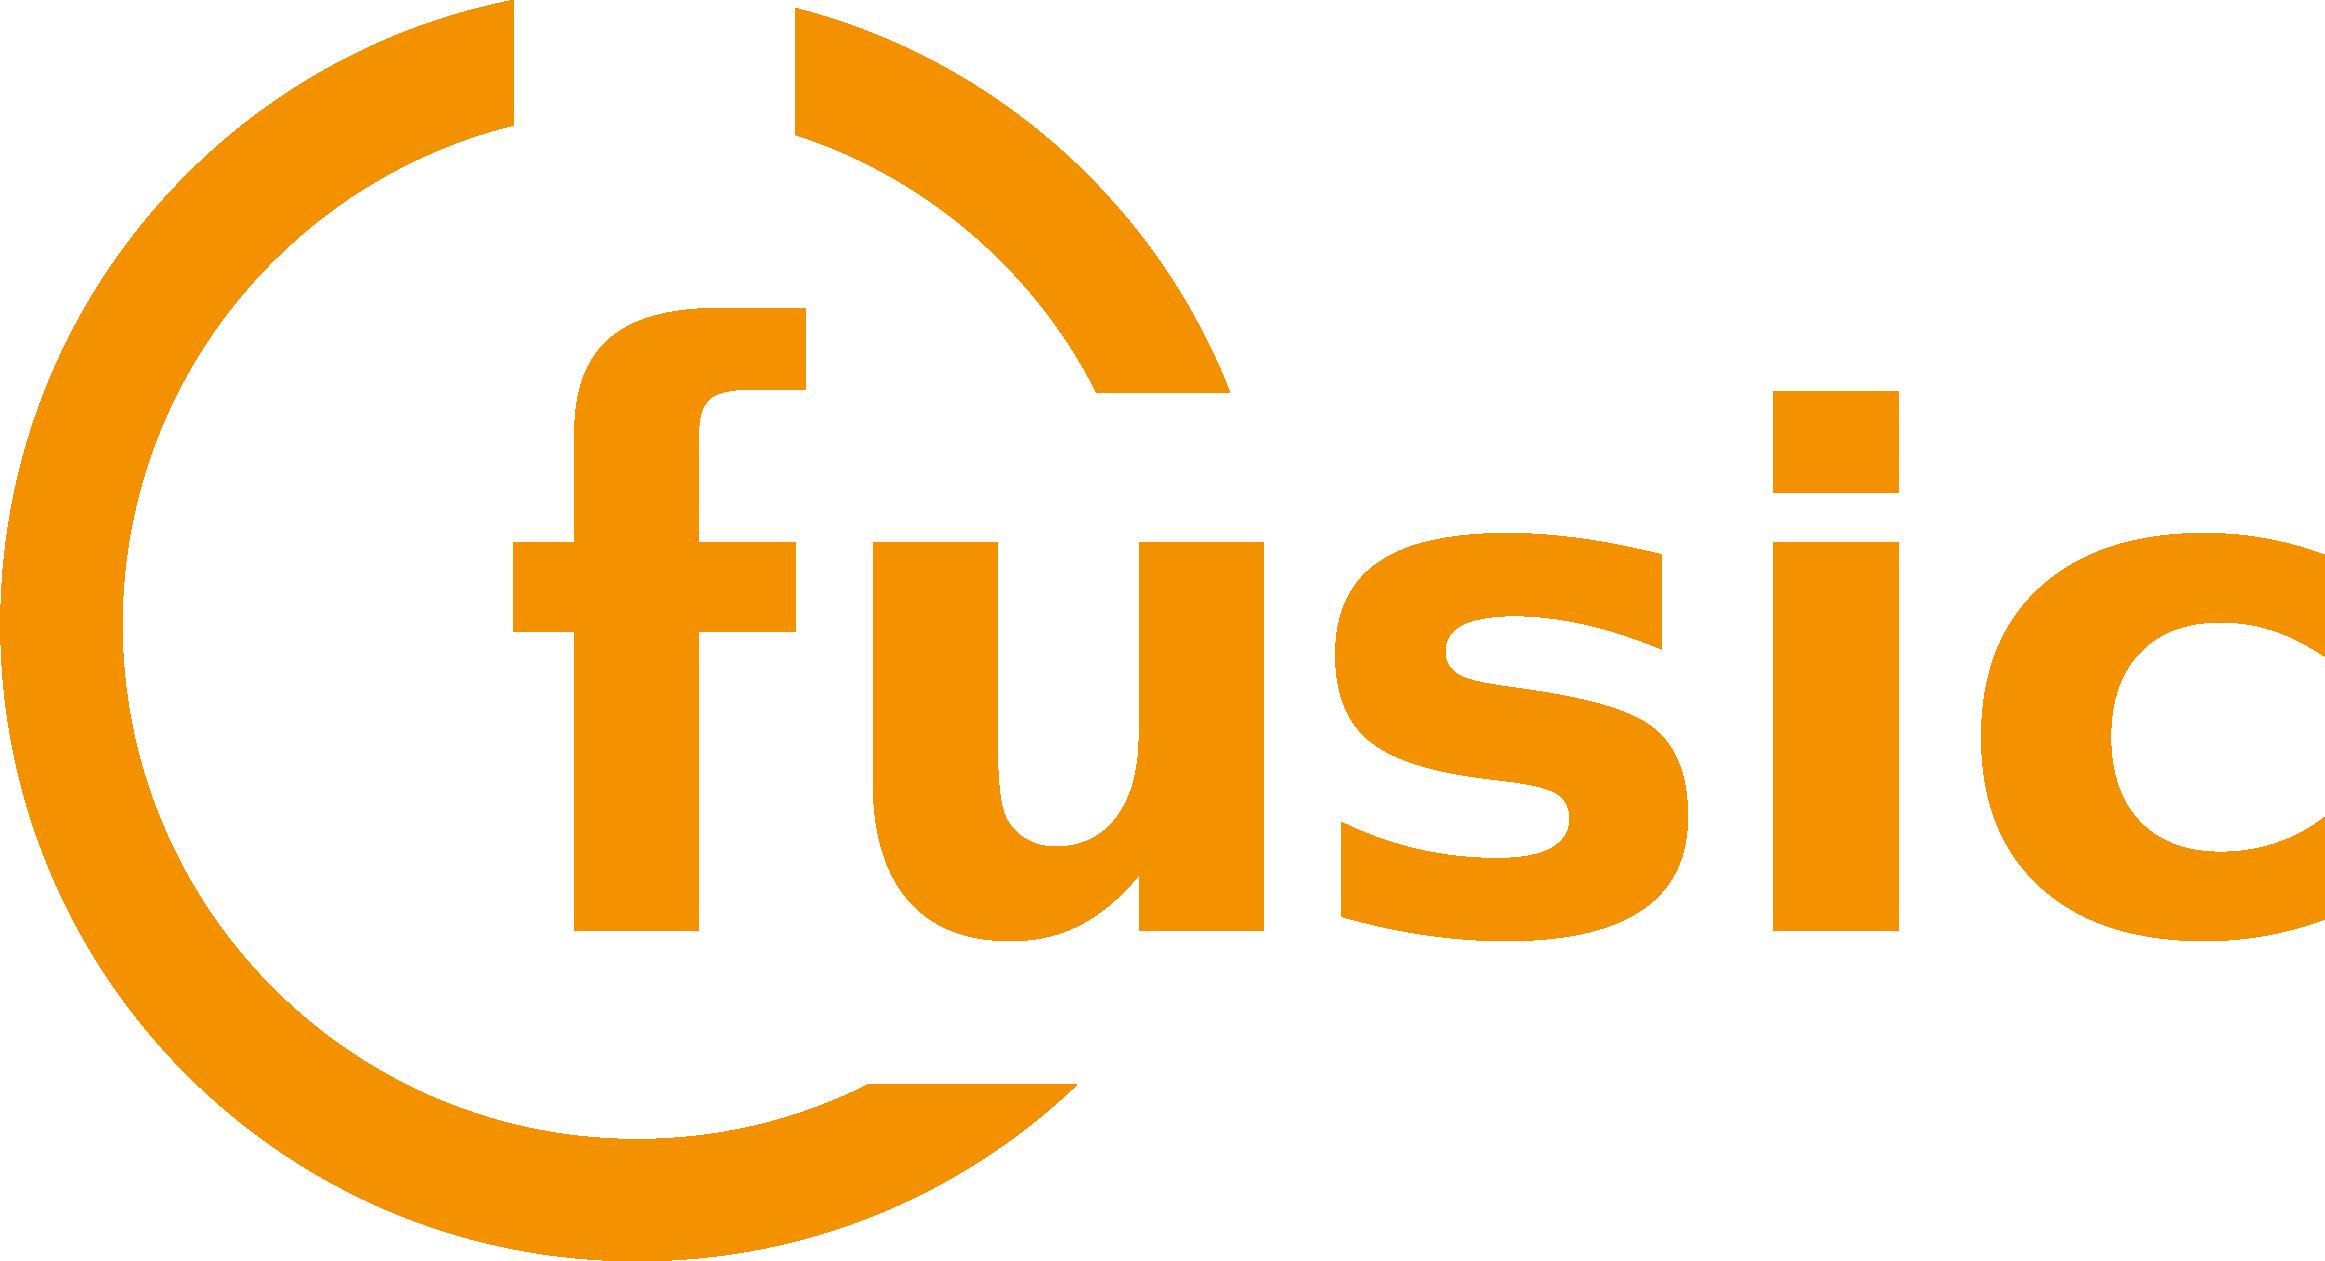 fusic - makes IT work